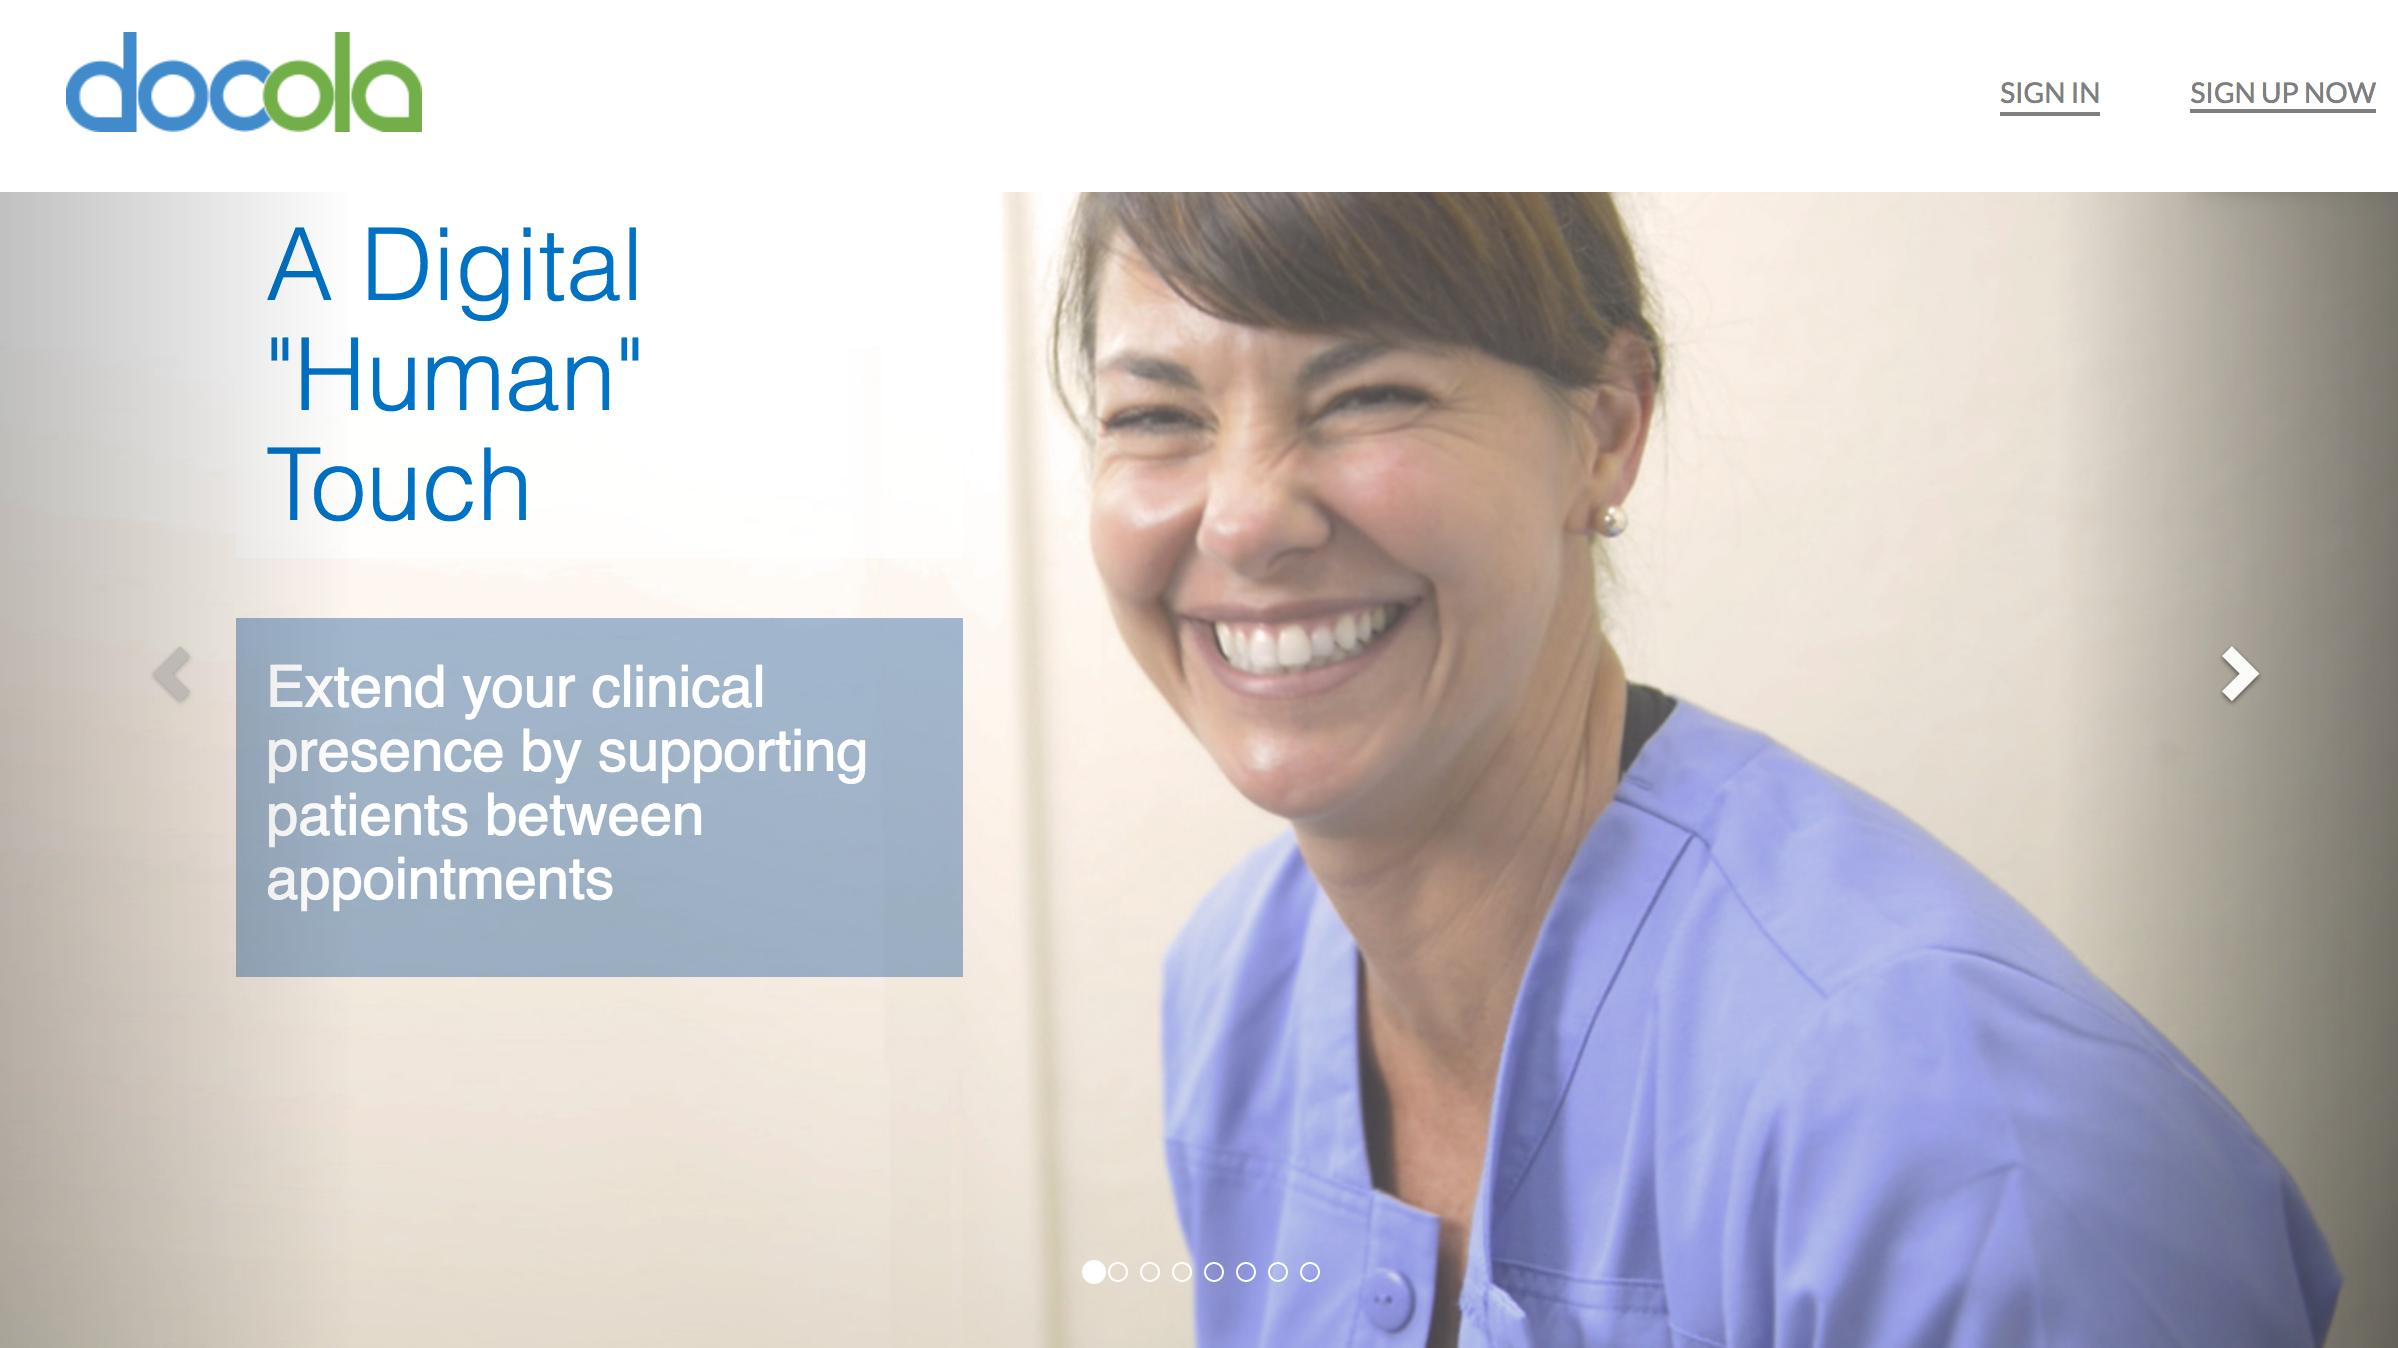 Private, HIPAA Compliant Patient-Provider Communication Platform - www.docola.com